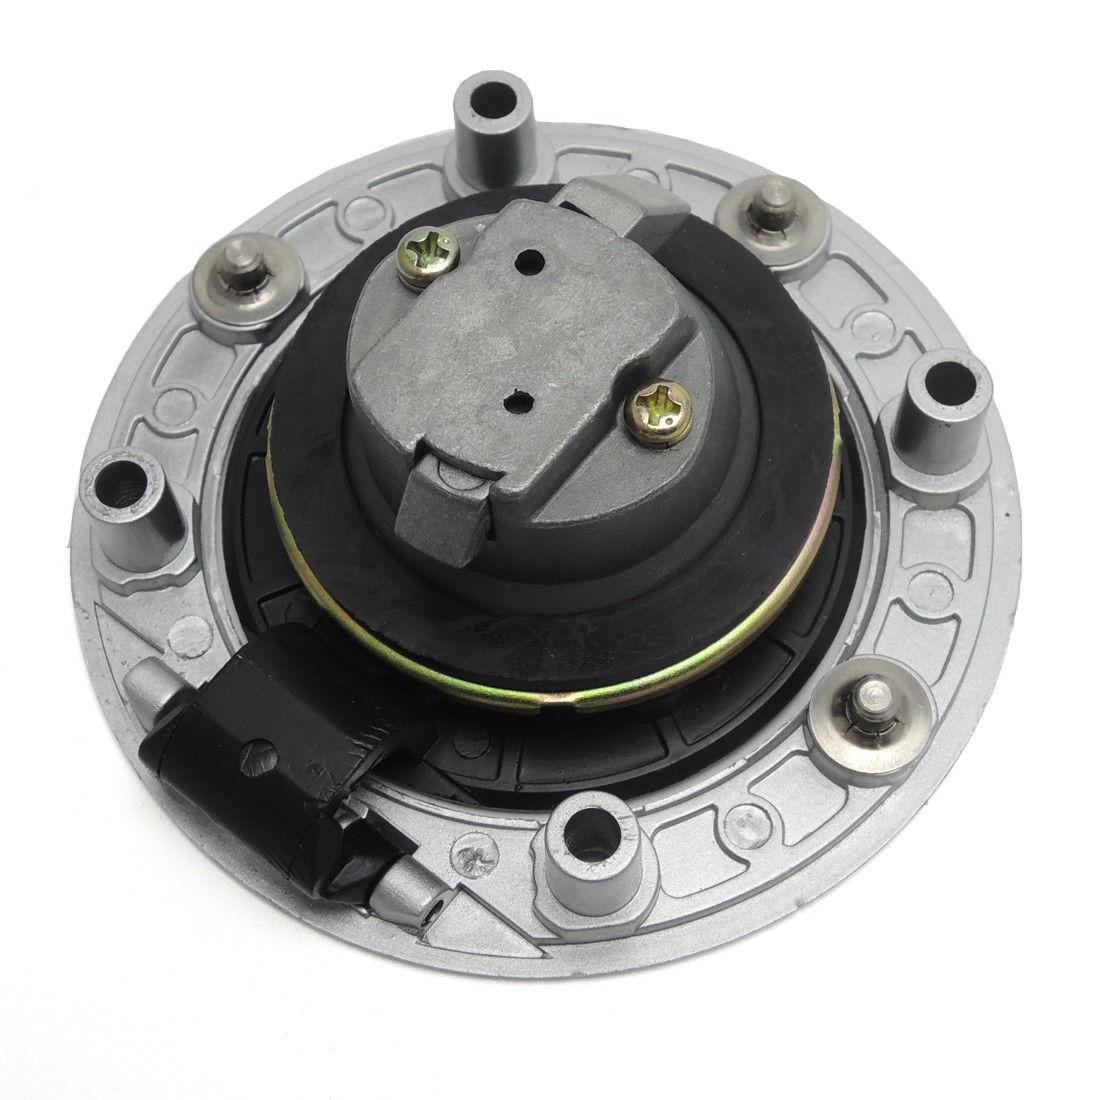 Fuel Gas Tank Cap Cover Lock Key For Suzuki Hayabusa GSXR 1300 1997-2007//Bandit